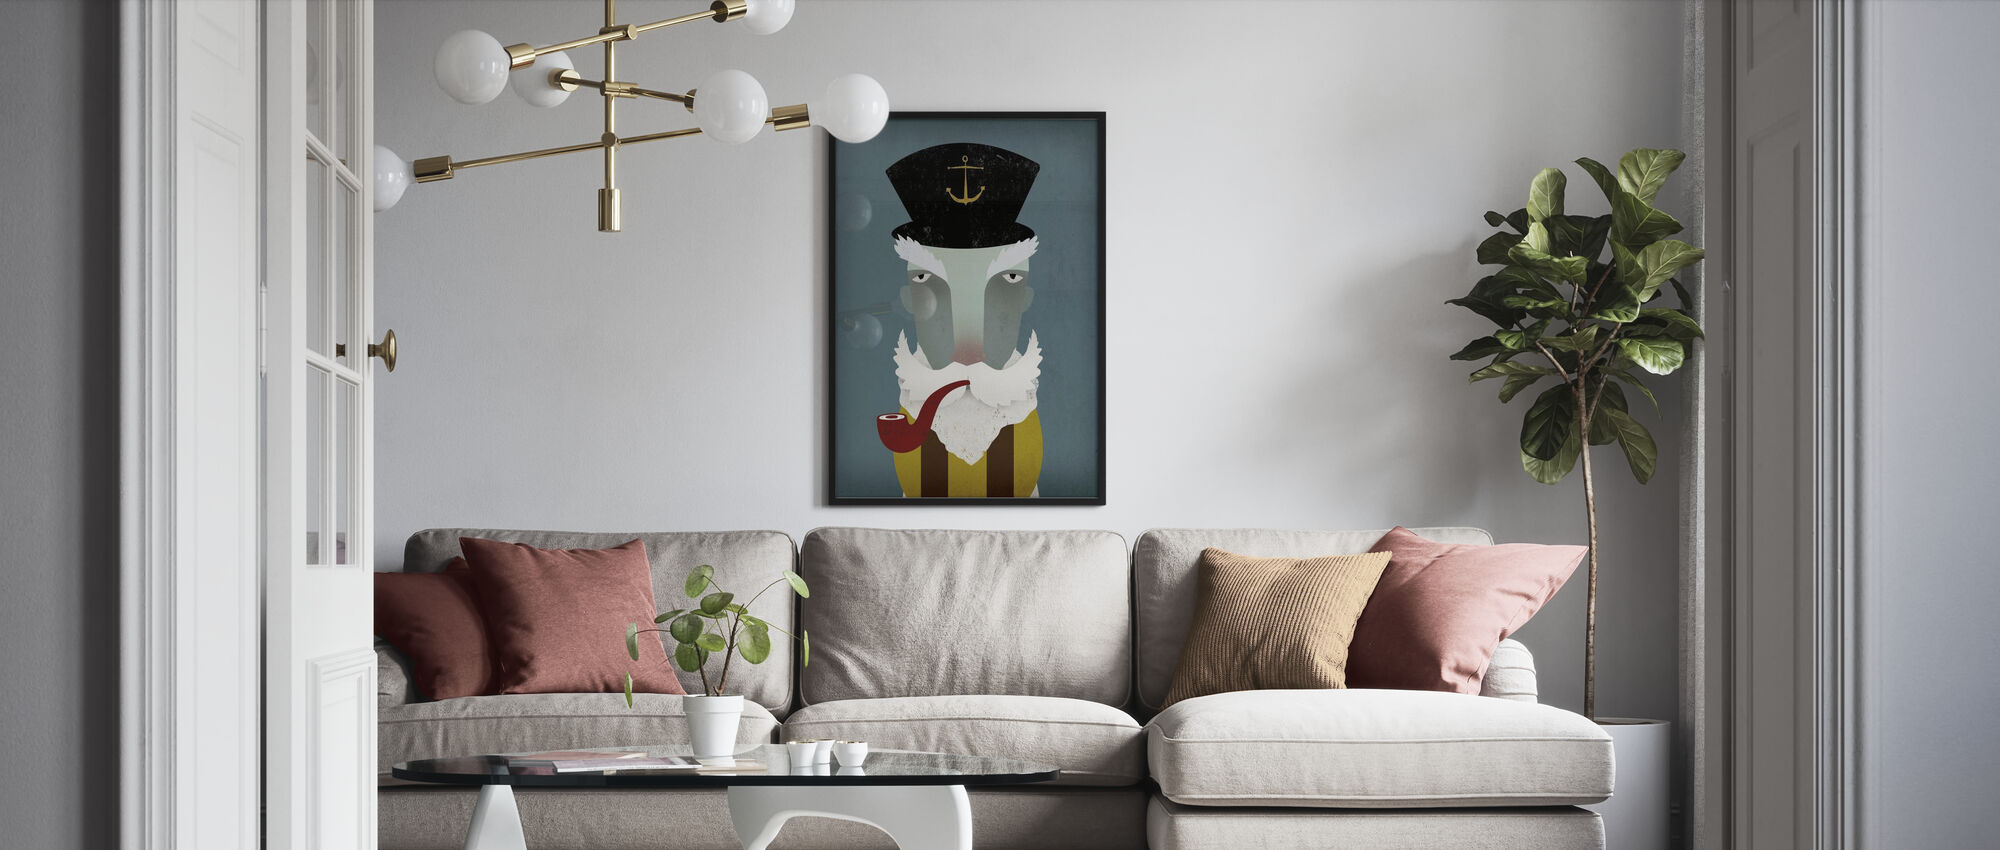 Fisherman - Poster - Living Room